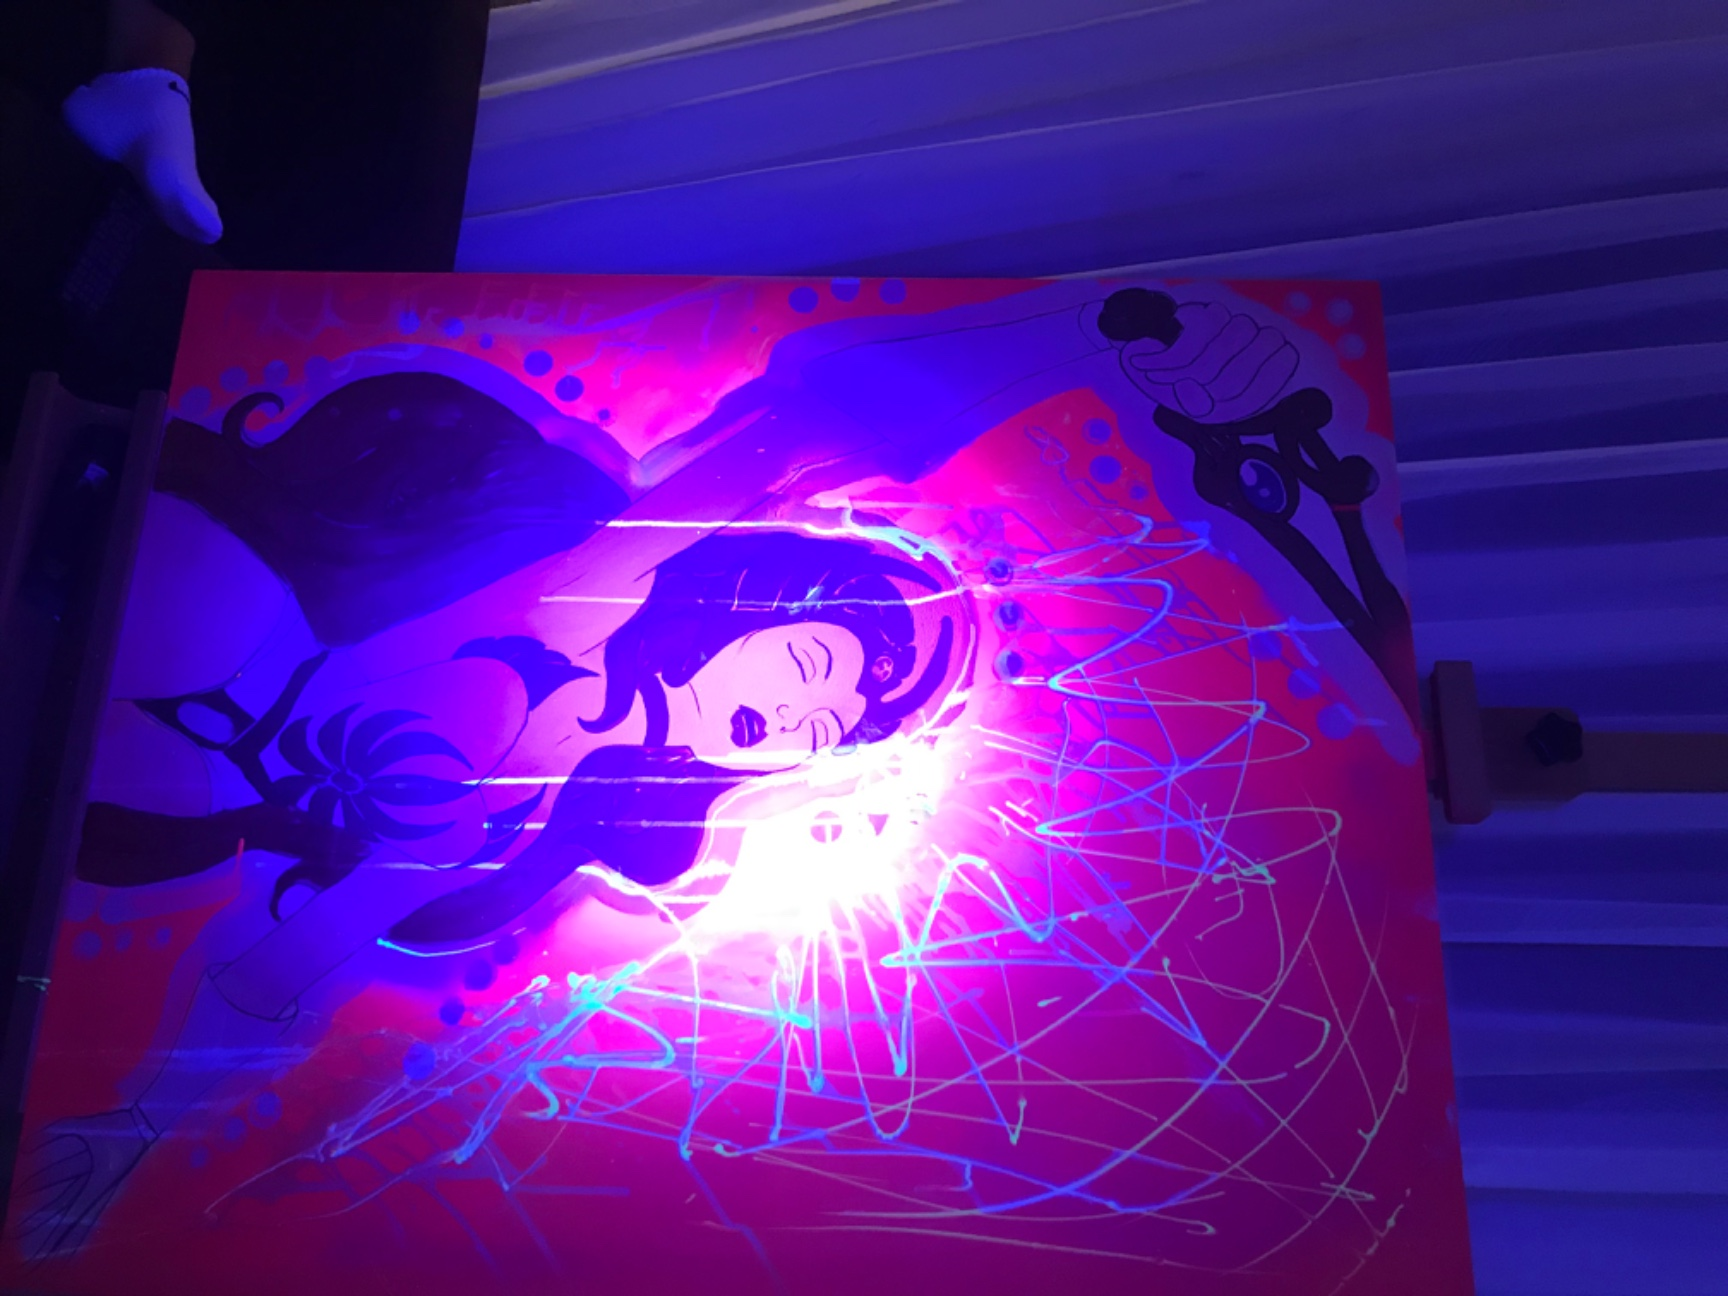 artigall: Seela Master of the Univers Gemälde skywalker